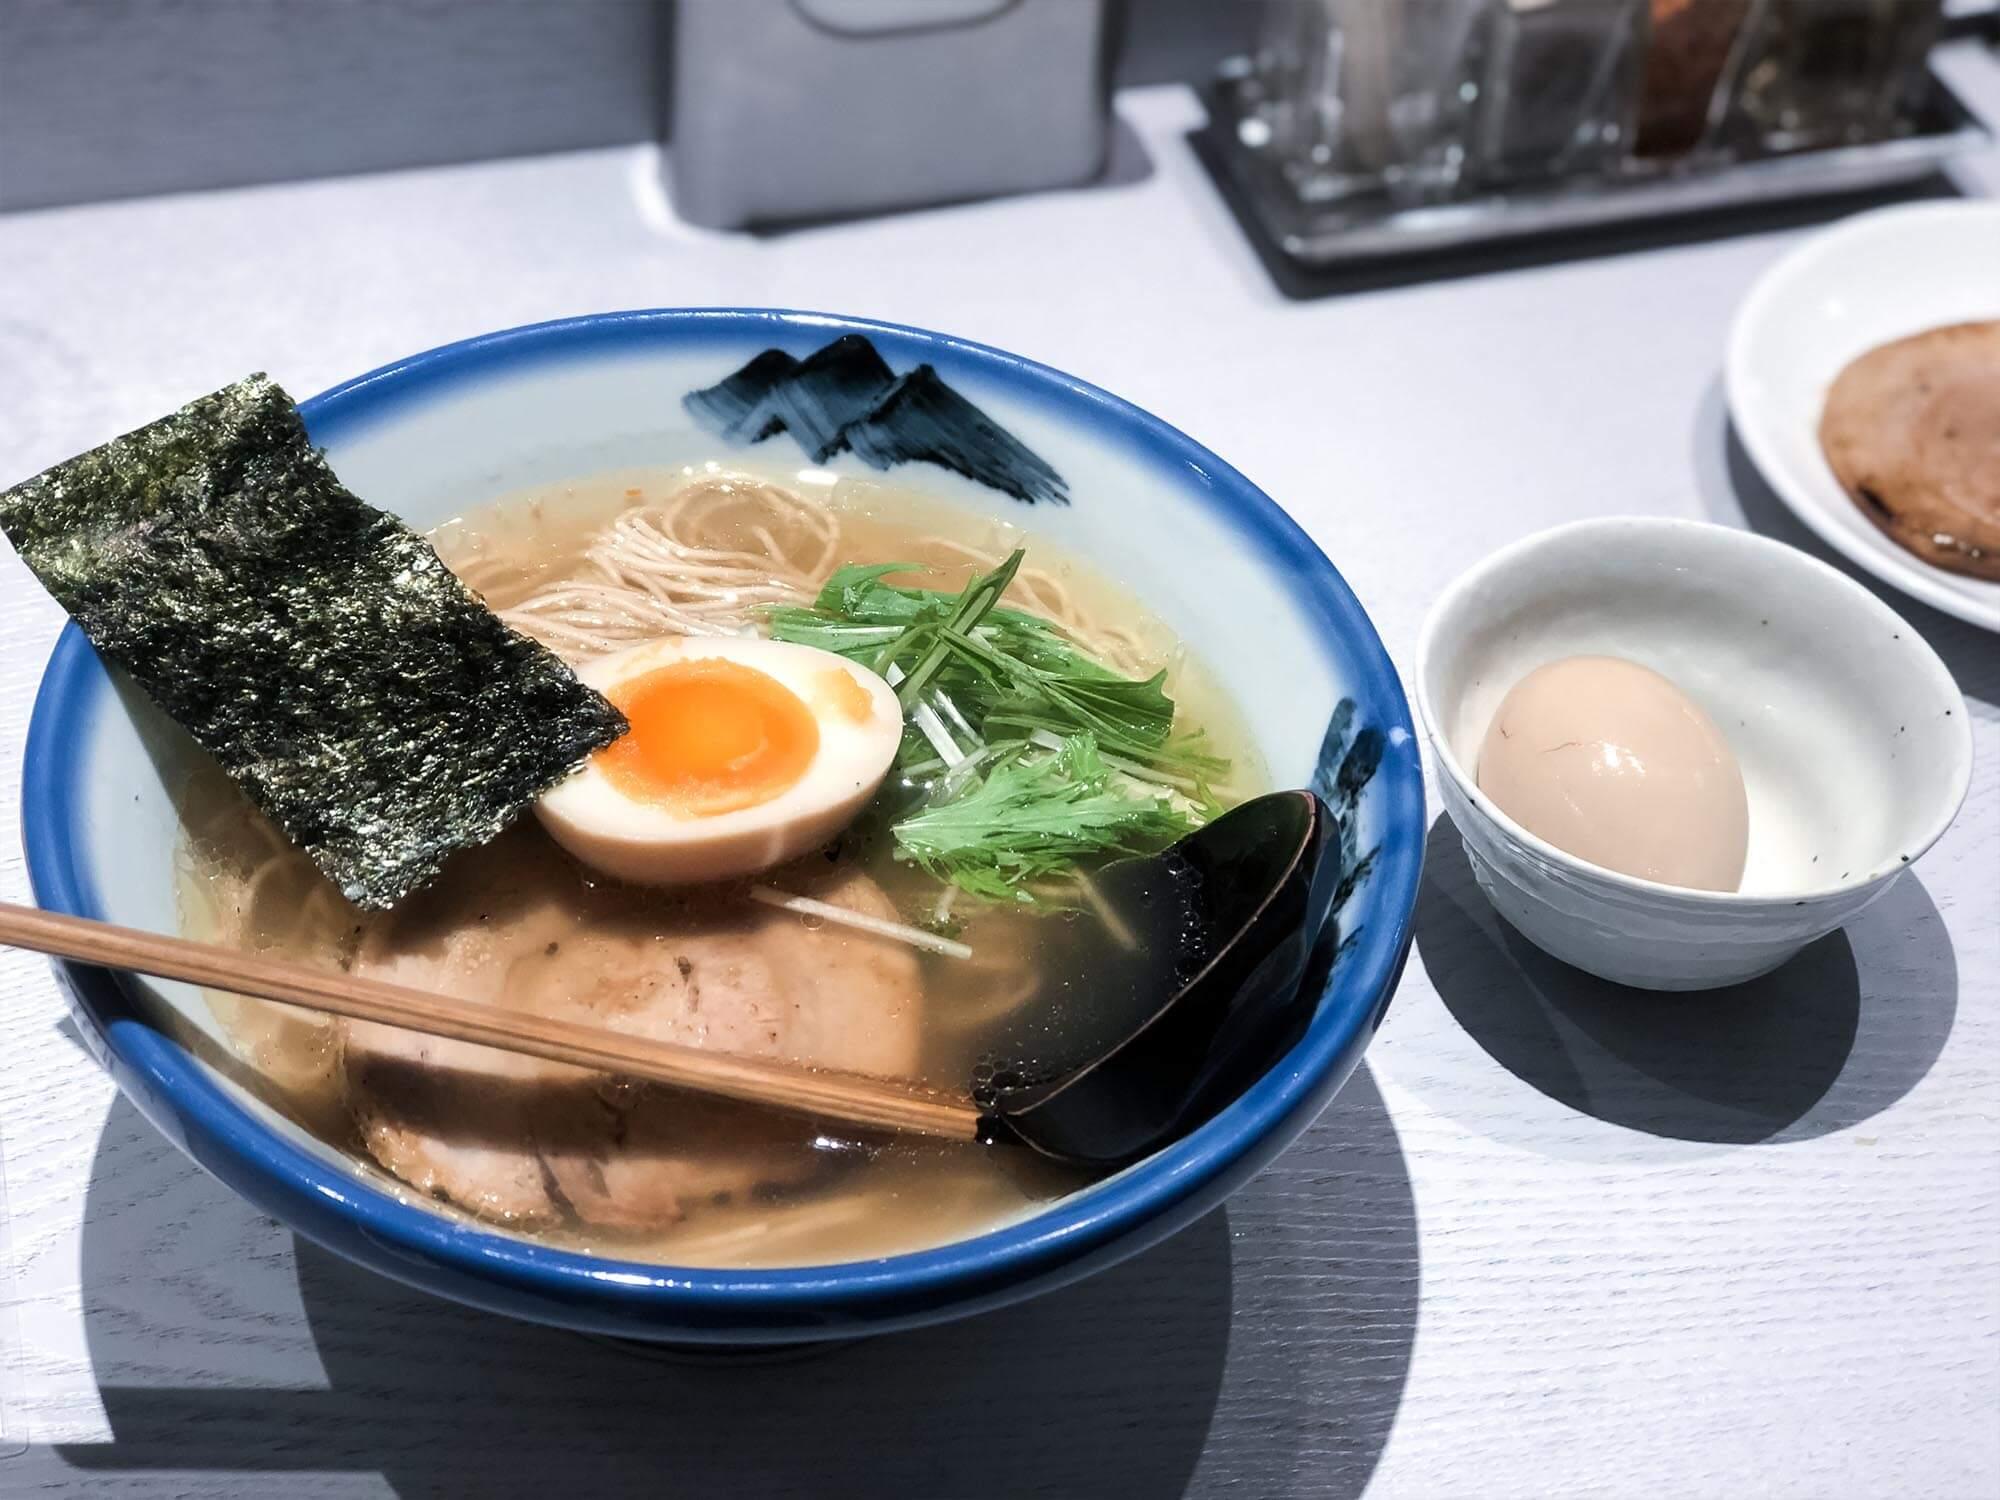 AFURI_六本木_柚子鹽拉麵